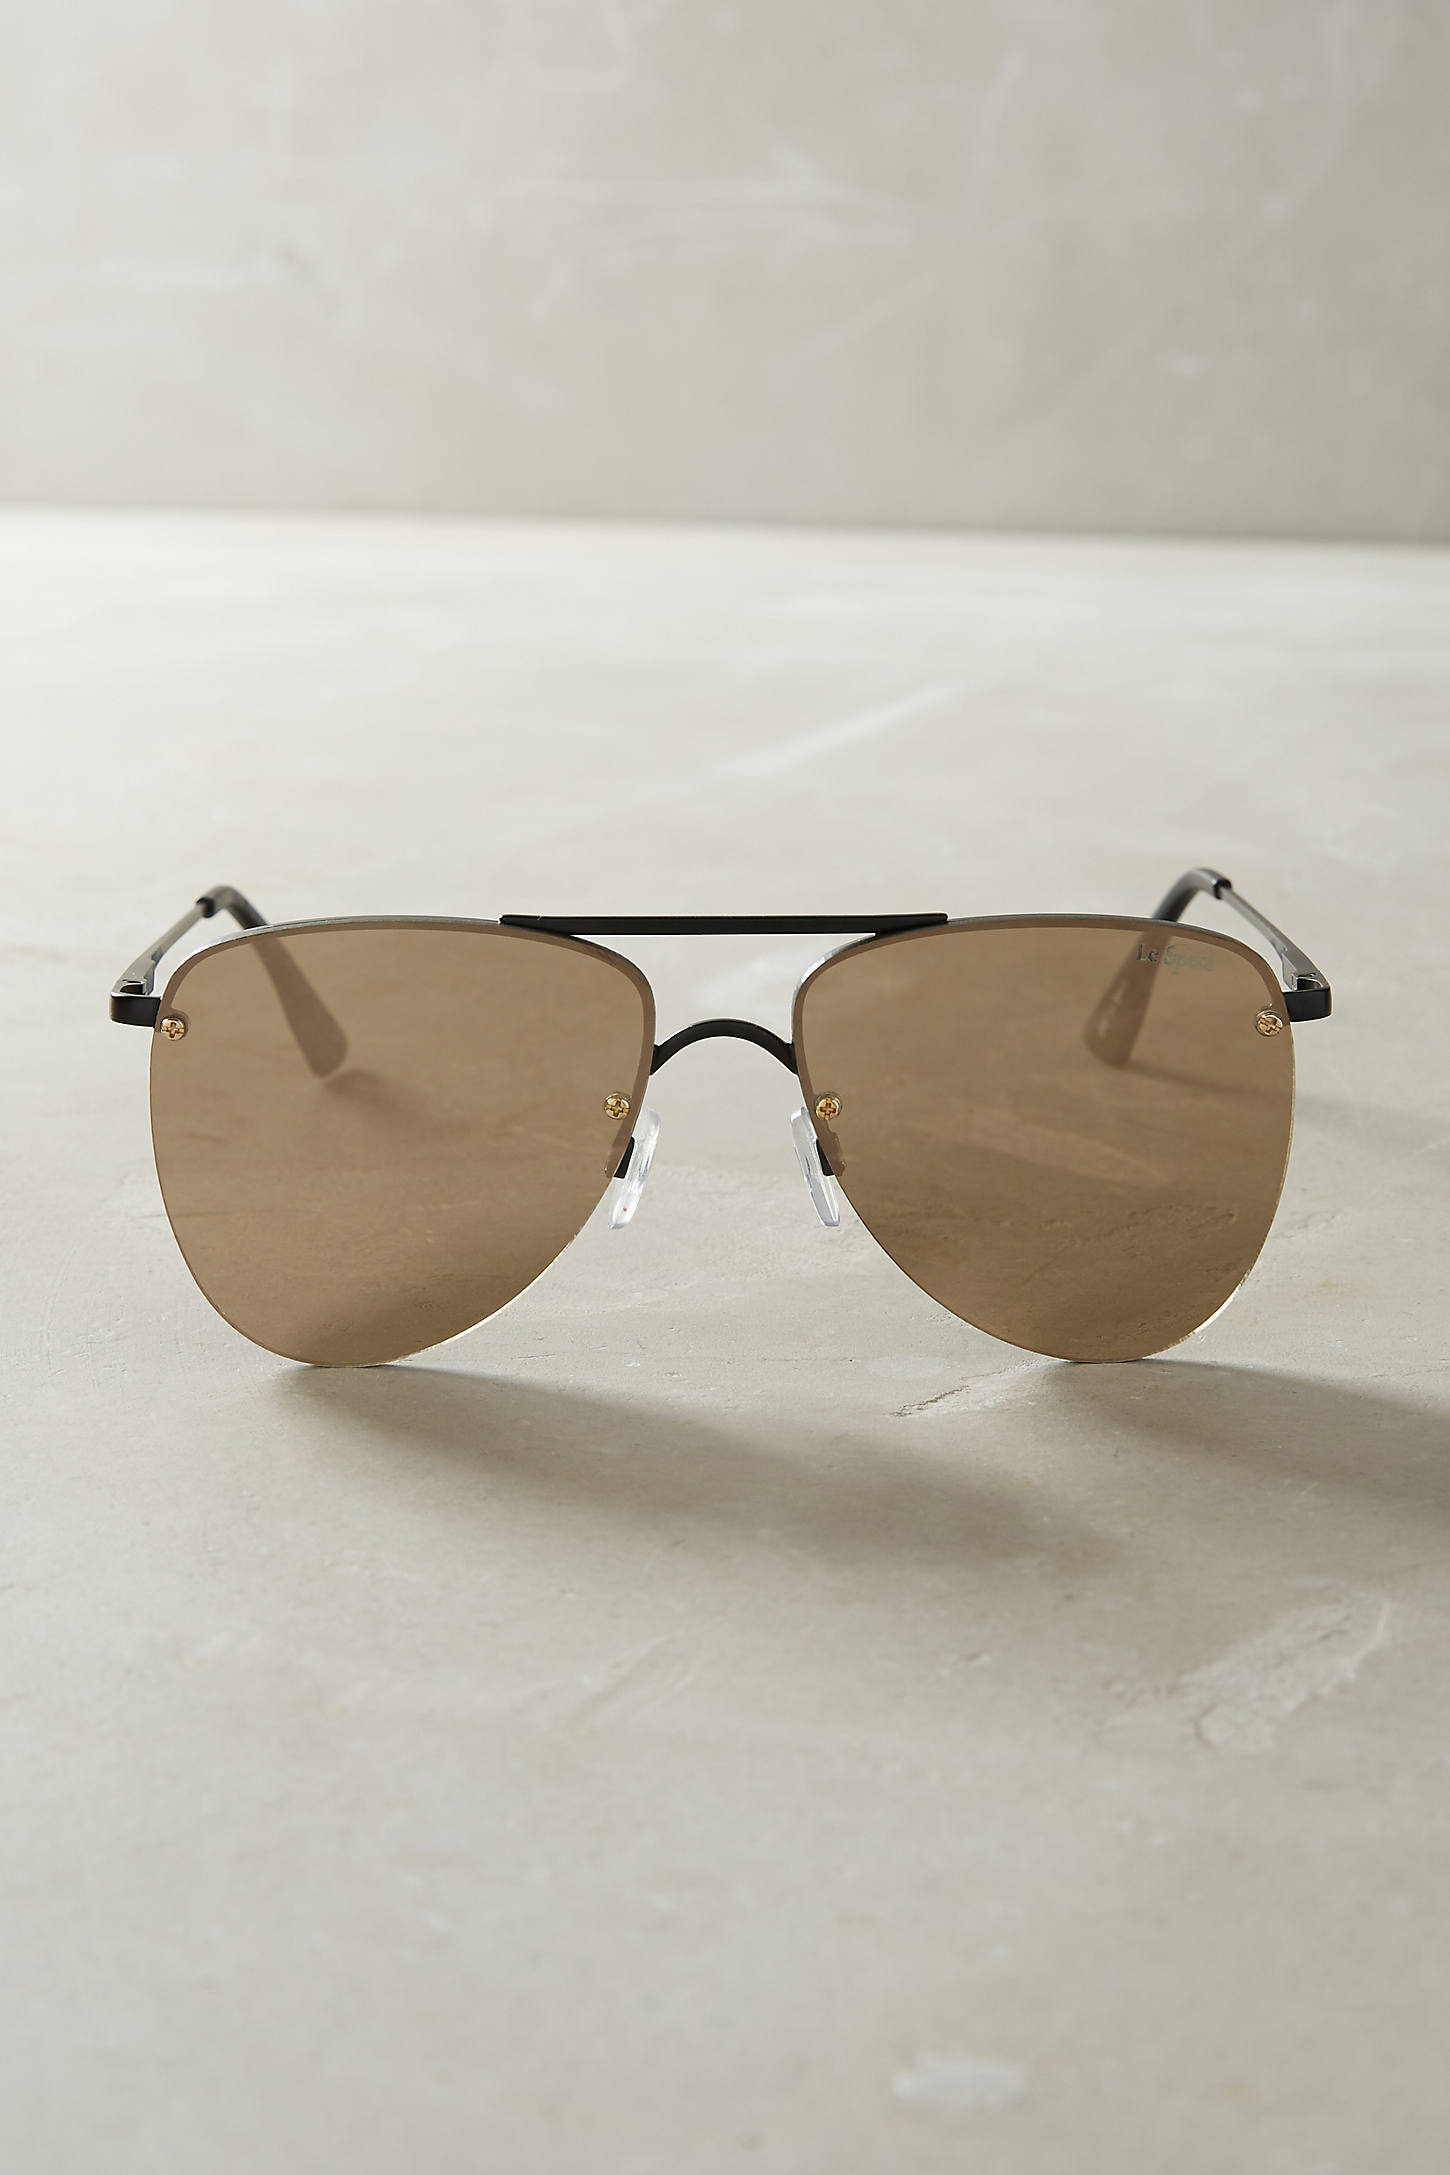 Le Specs The Prince Mirrored Aviator Sunglasses